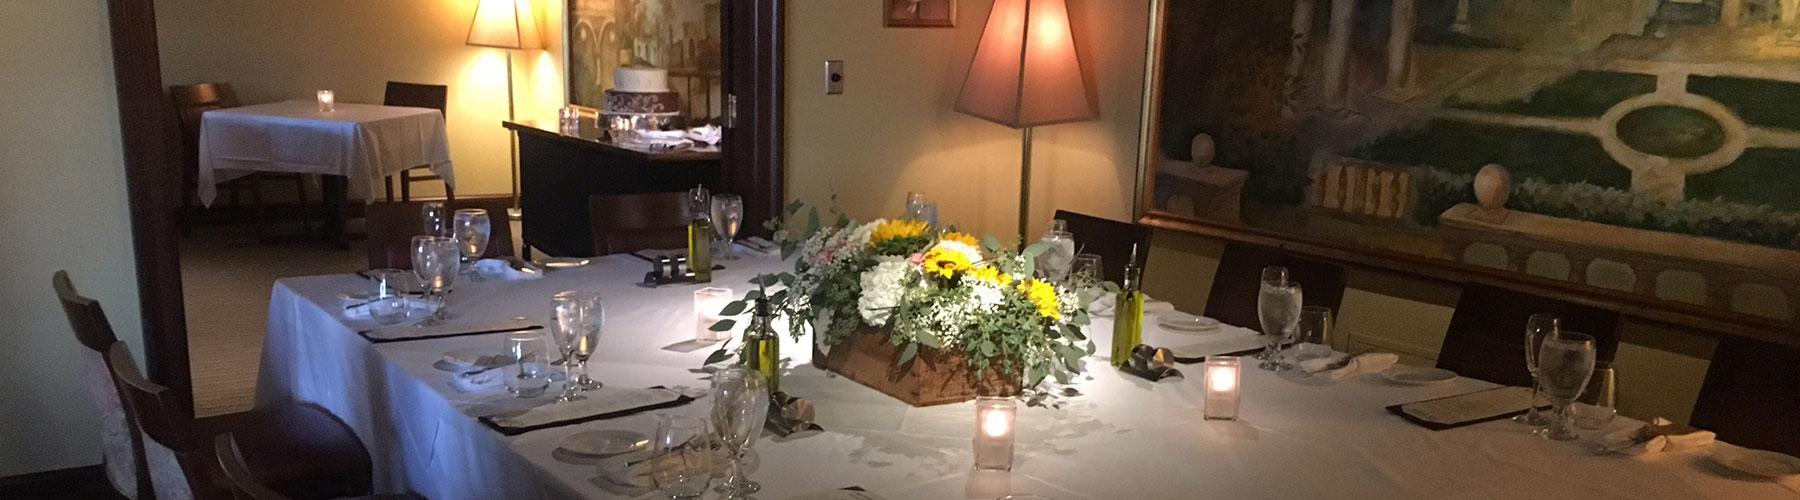 Private Dining Venue